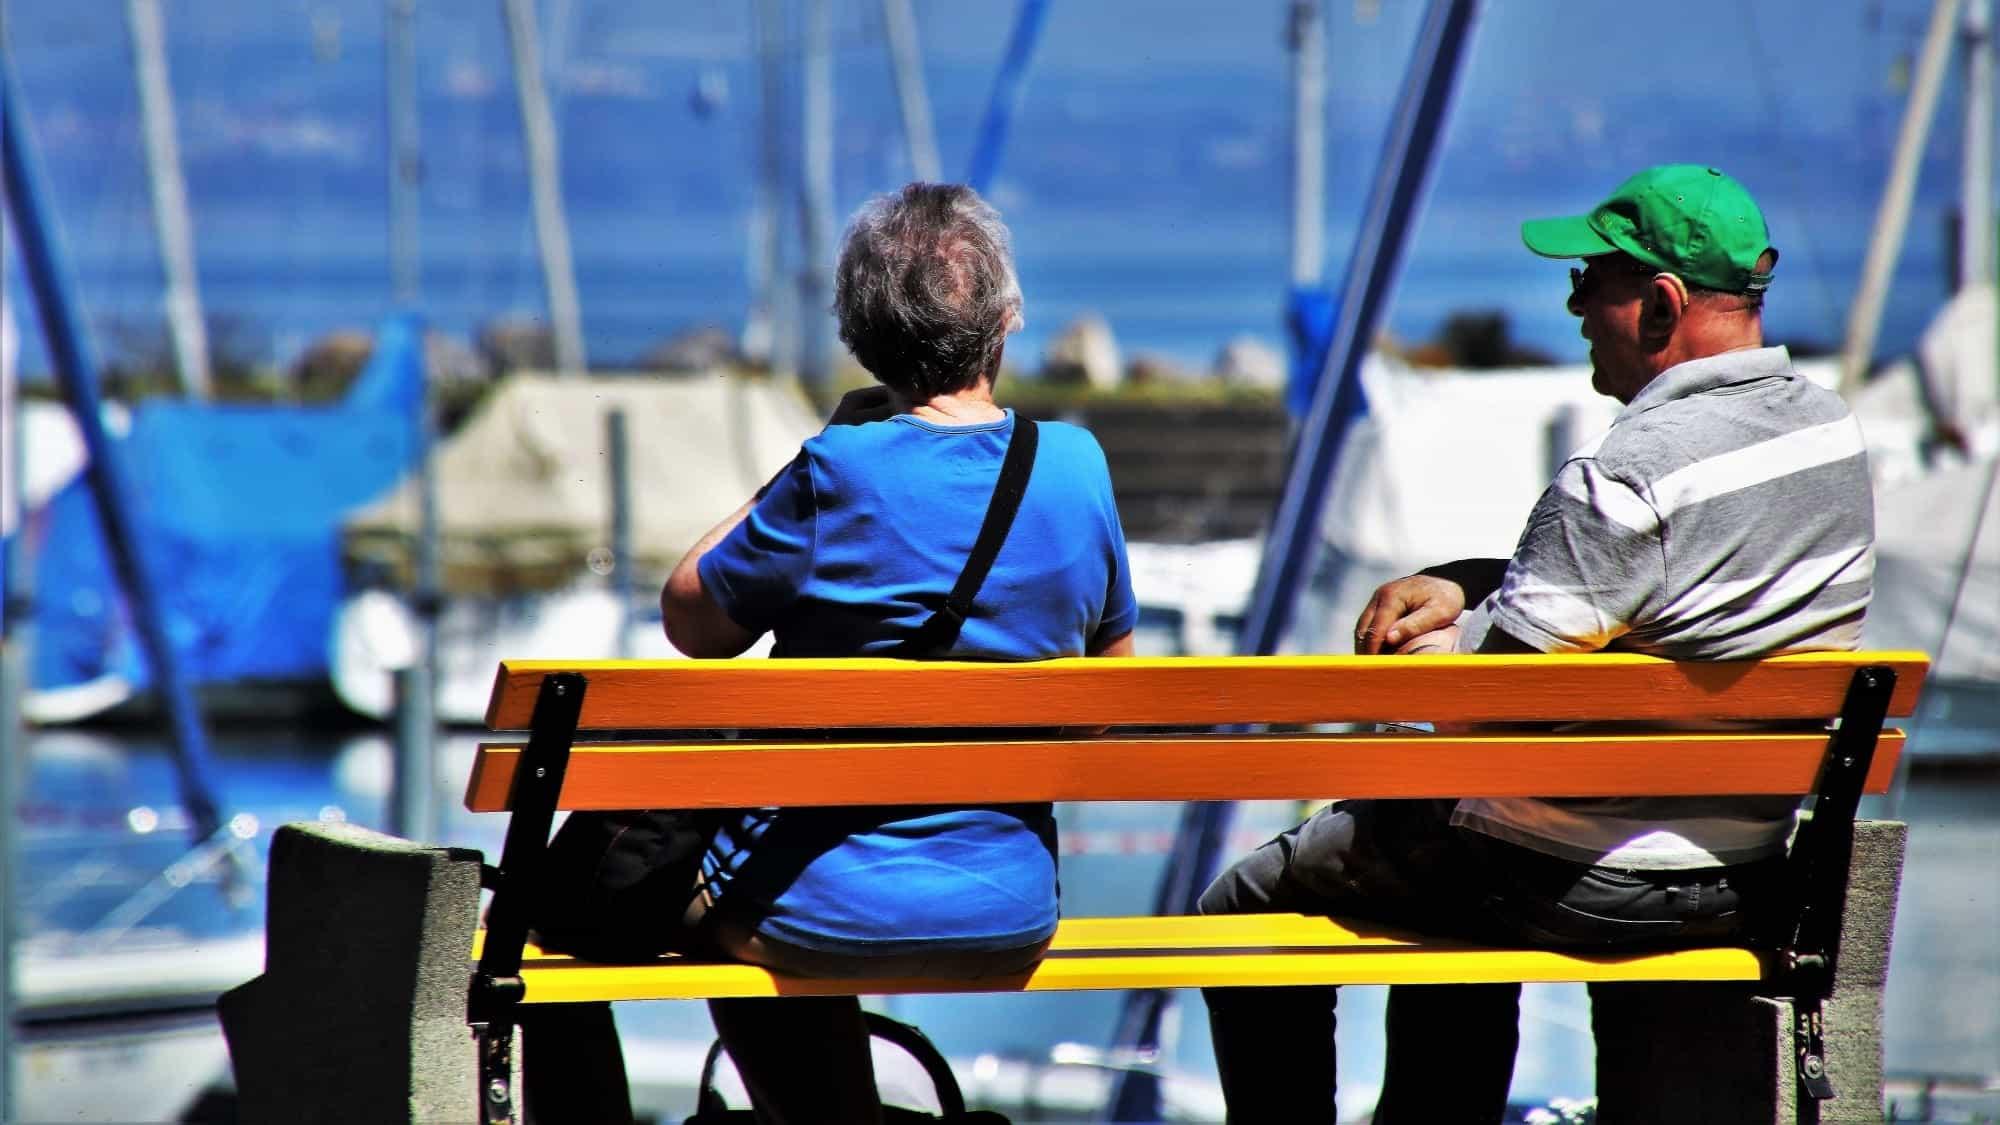 Seniors Meeting Seniors: 5 Ways Seniors Can Make New Friends